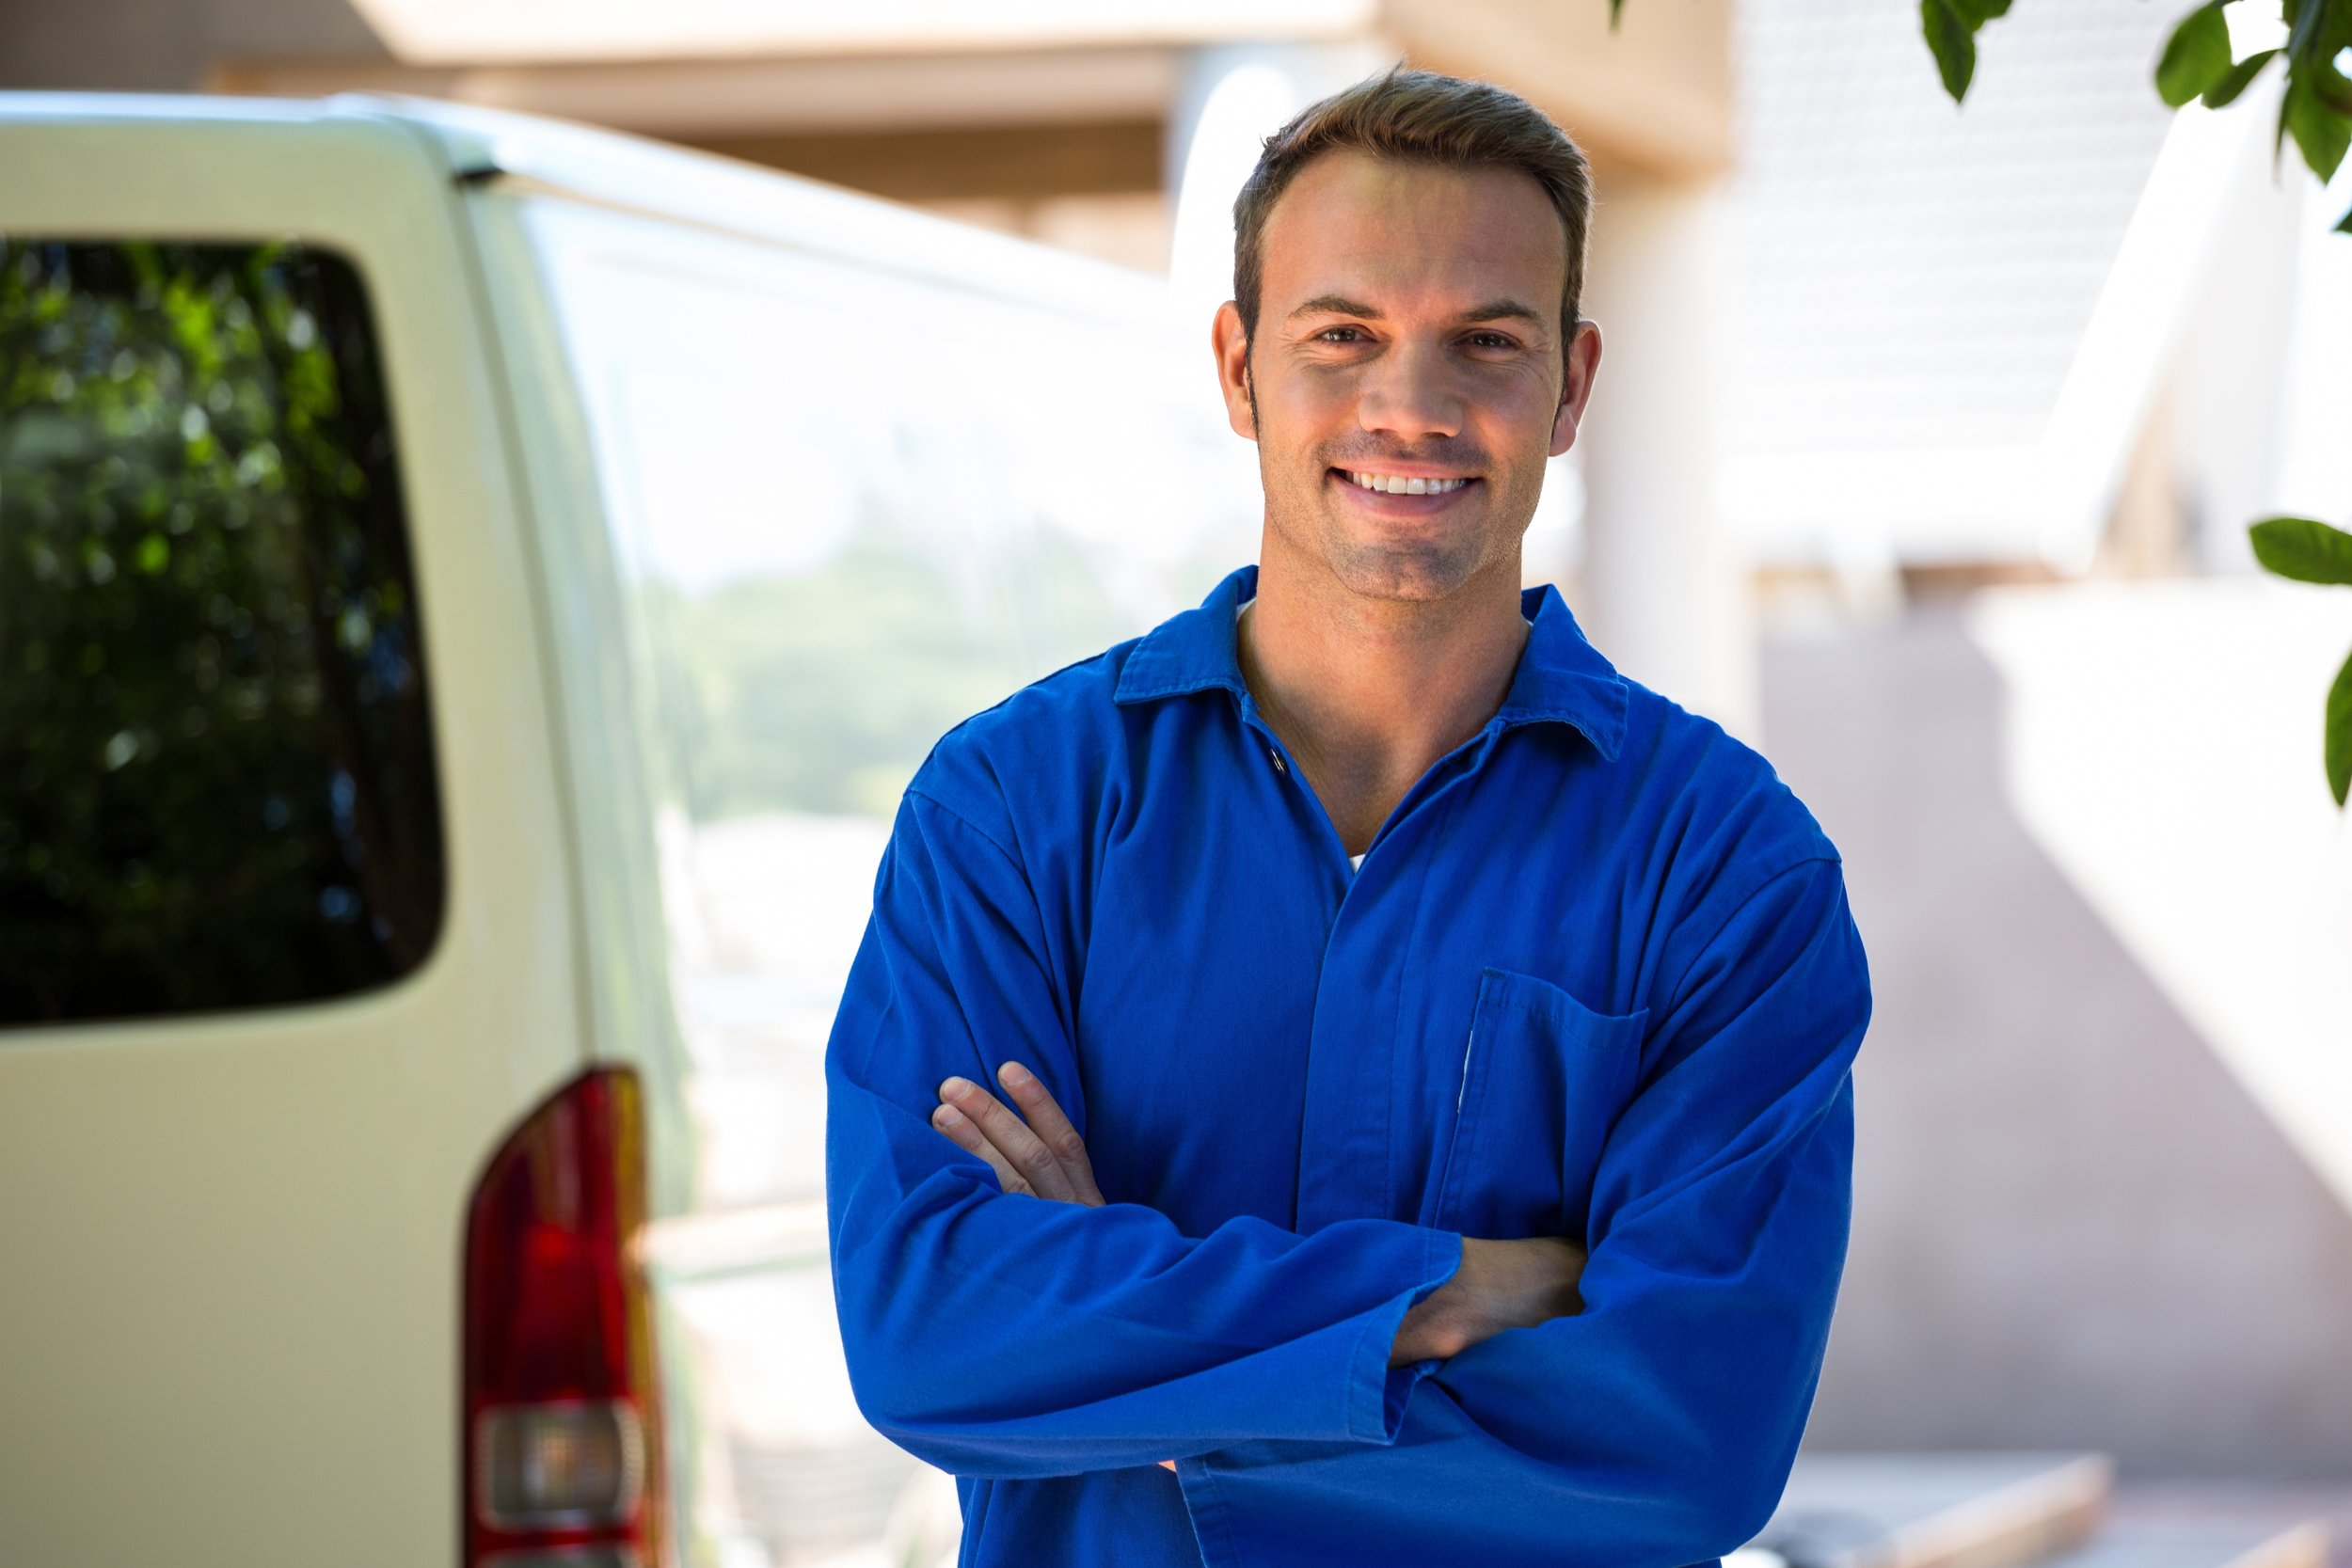 San Antonio Roadside Assistance